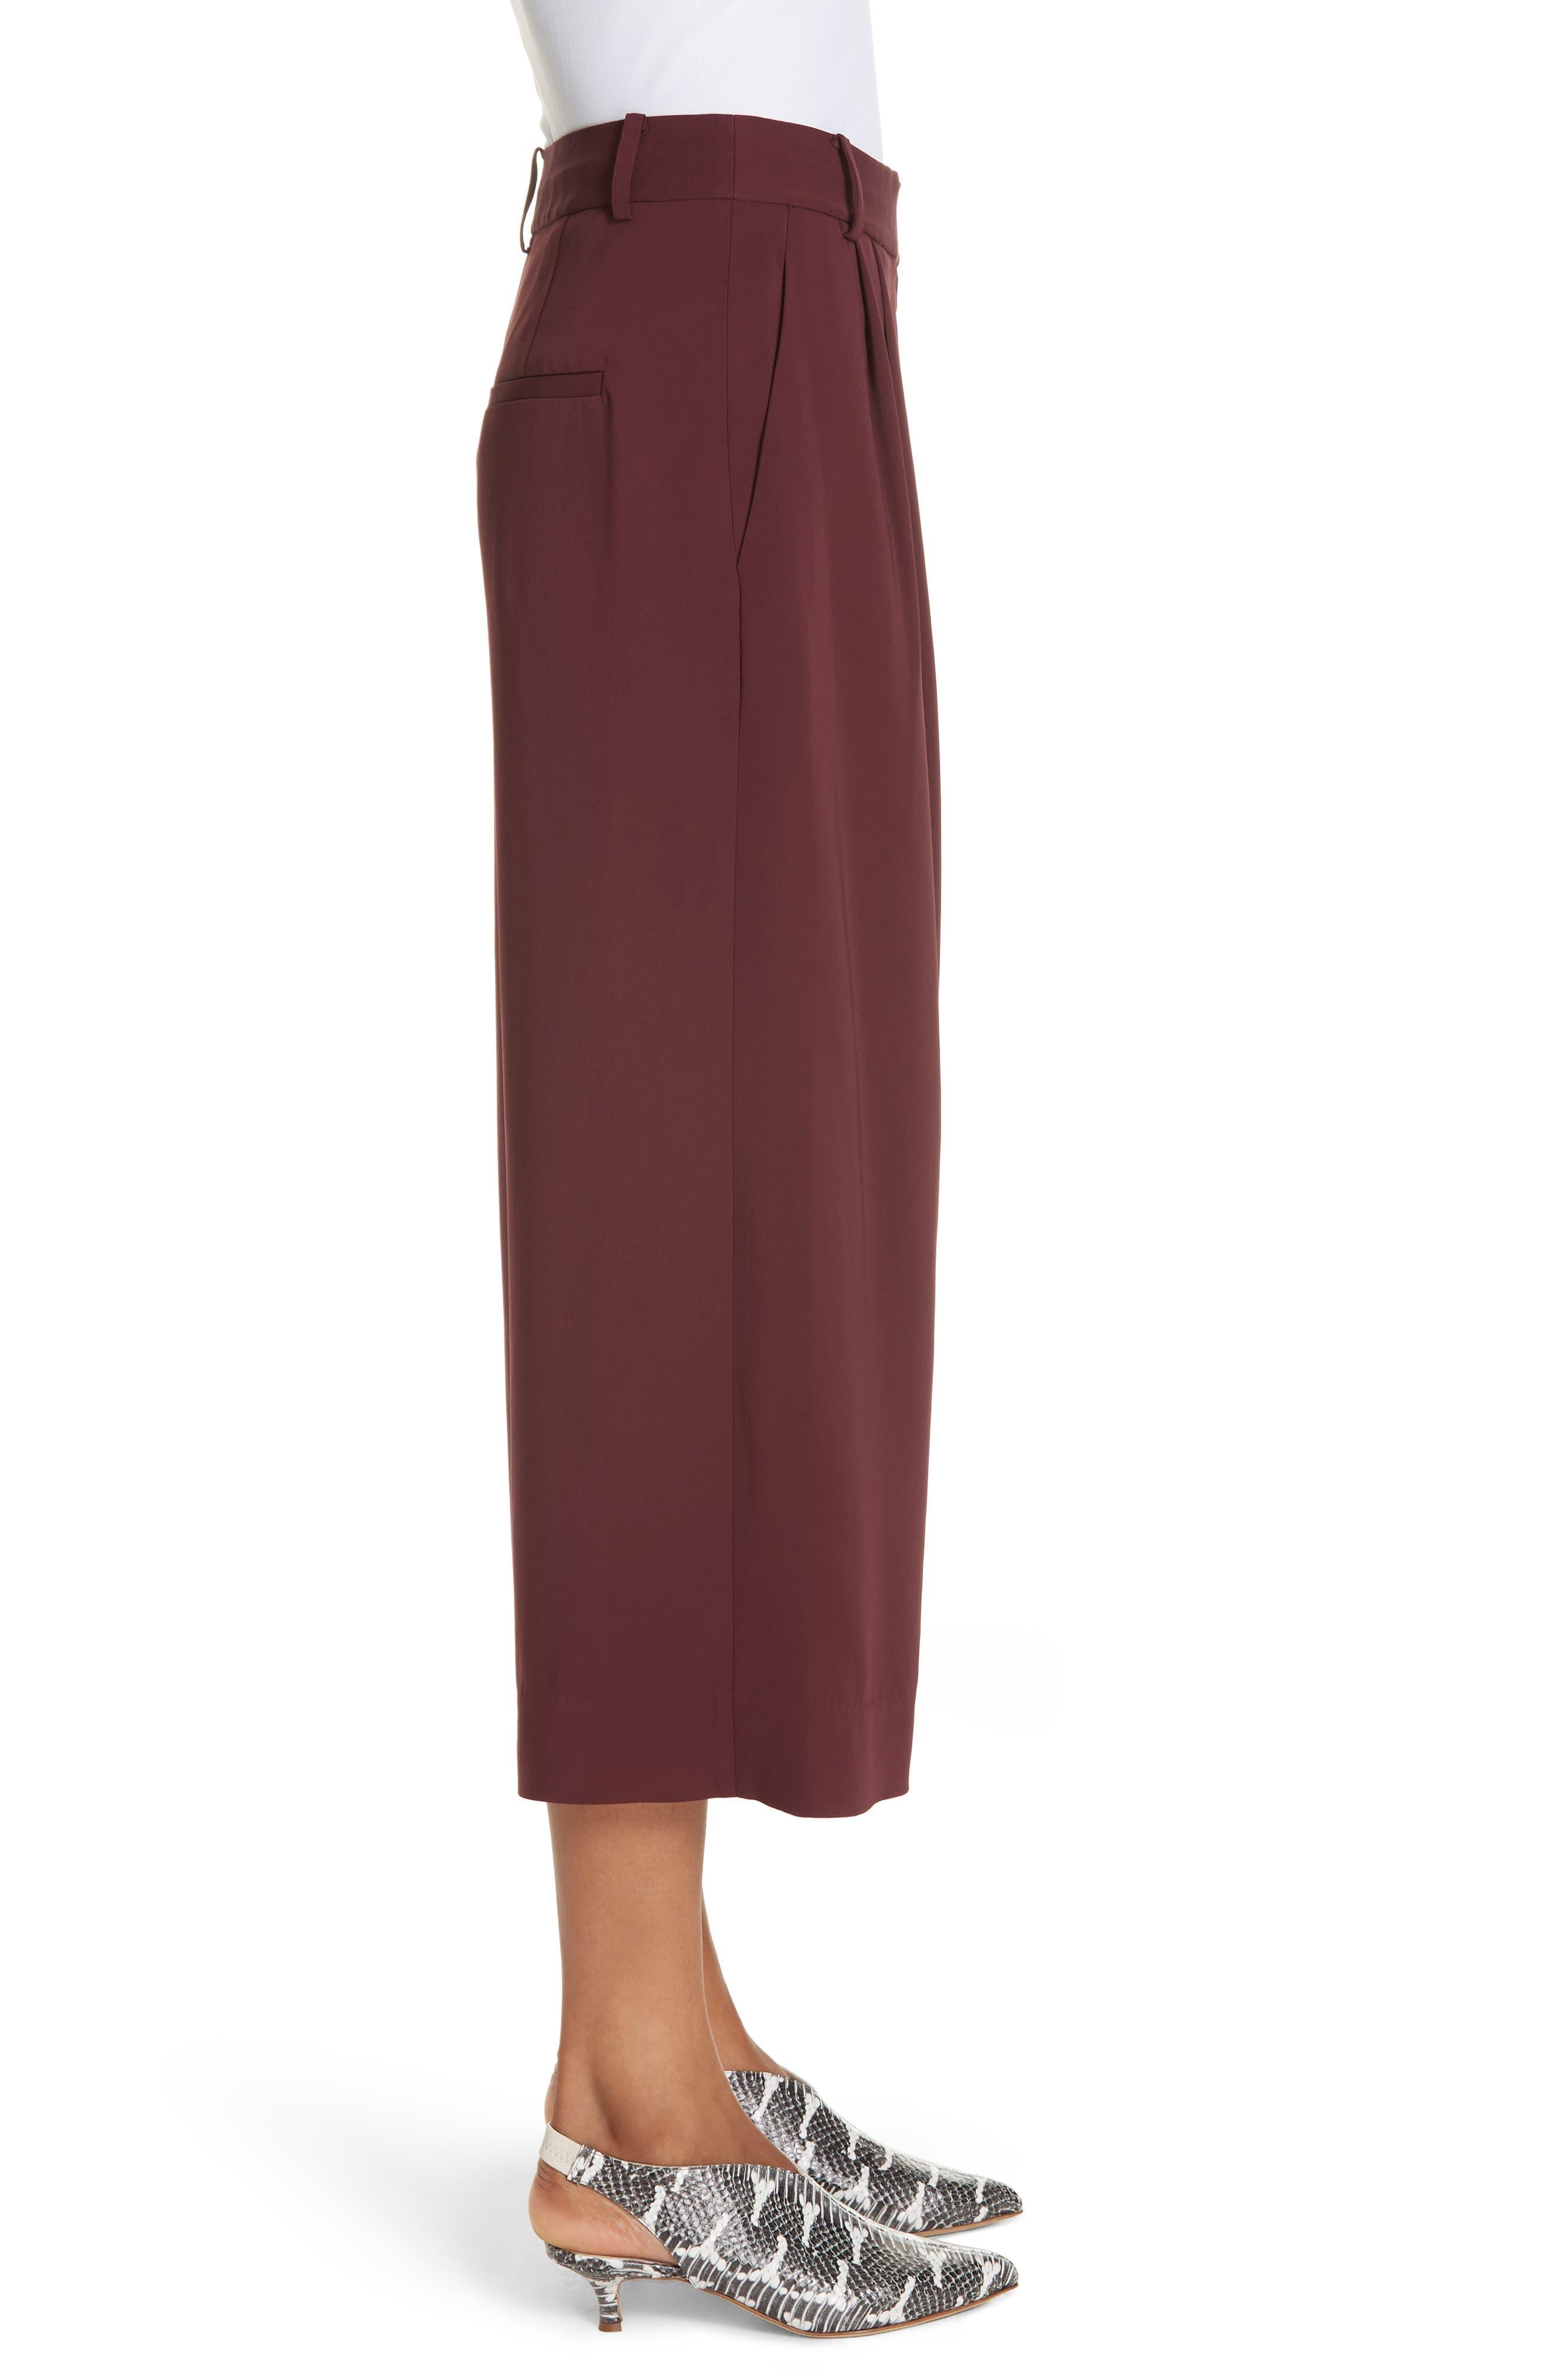 TIBI,                             Stella Stretch Suiting Crop Pants,                             Alternate thumbnail 3, color,                             DARK CURRANT